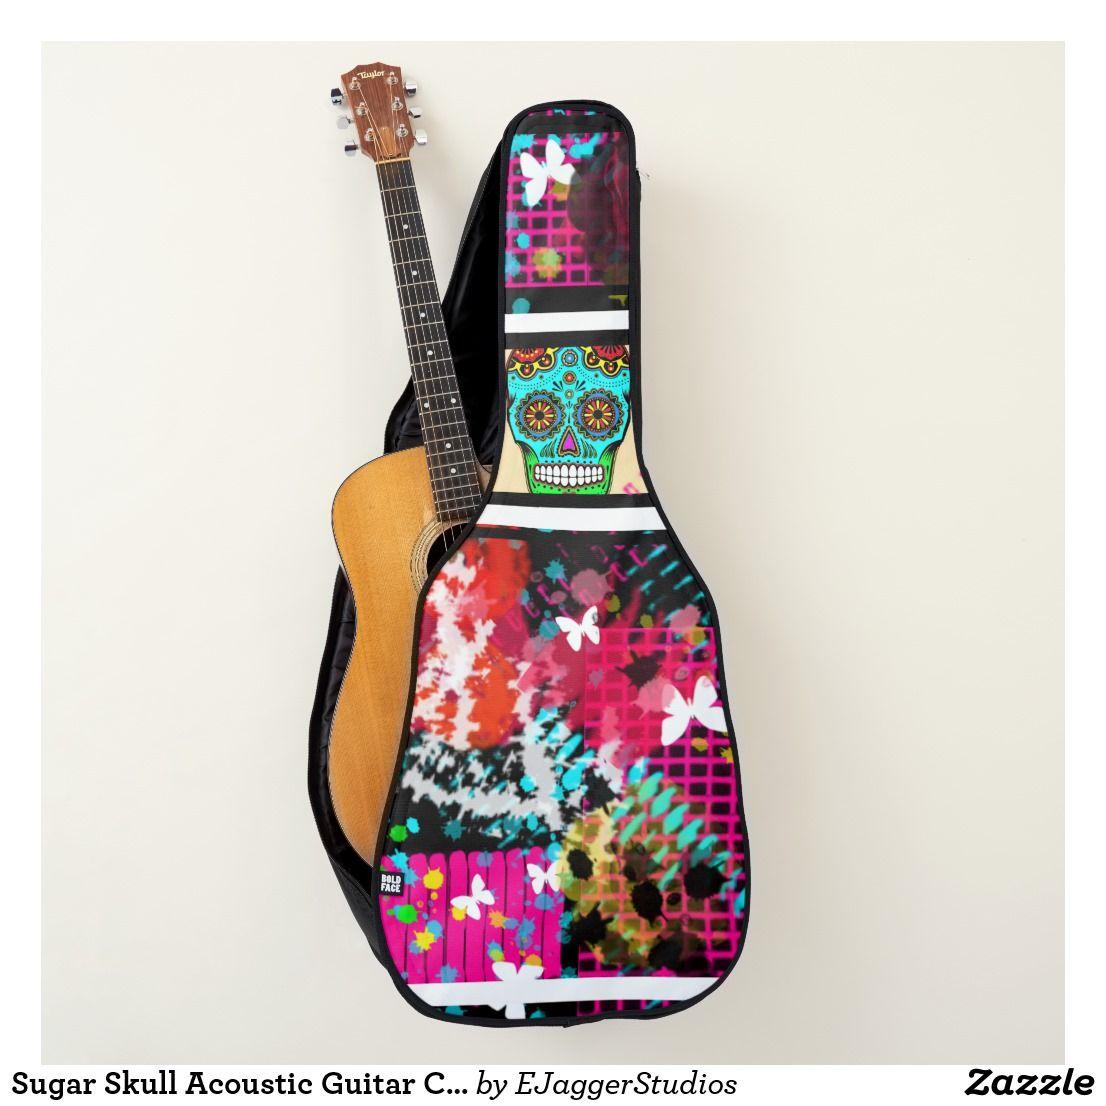 Sugar Skull Acoustic Guitar Case Zazzle Co Uk Acoustic Guitar Case Guitar Case Acoustic Guitar